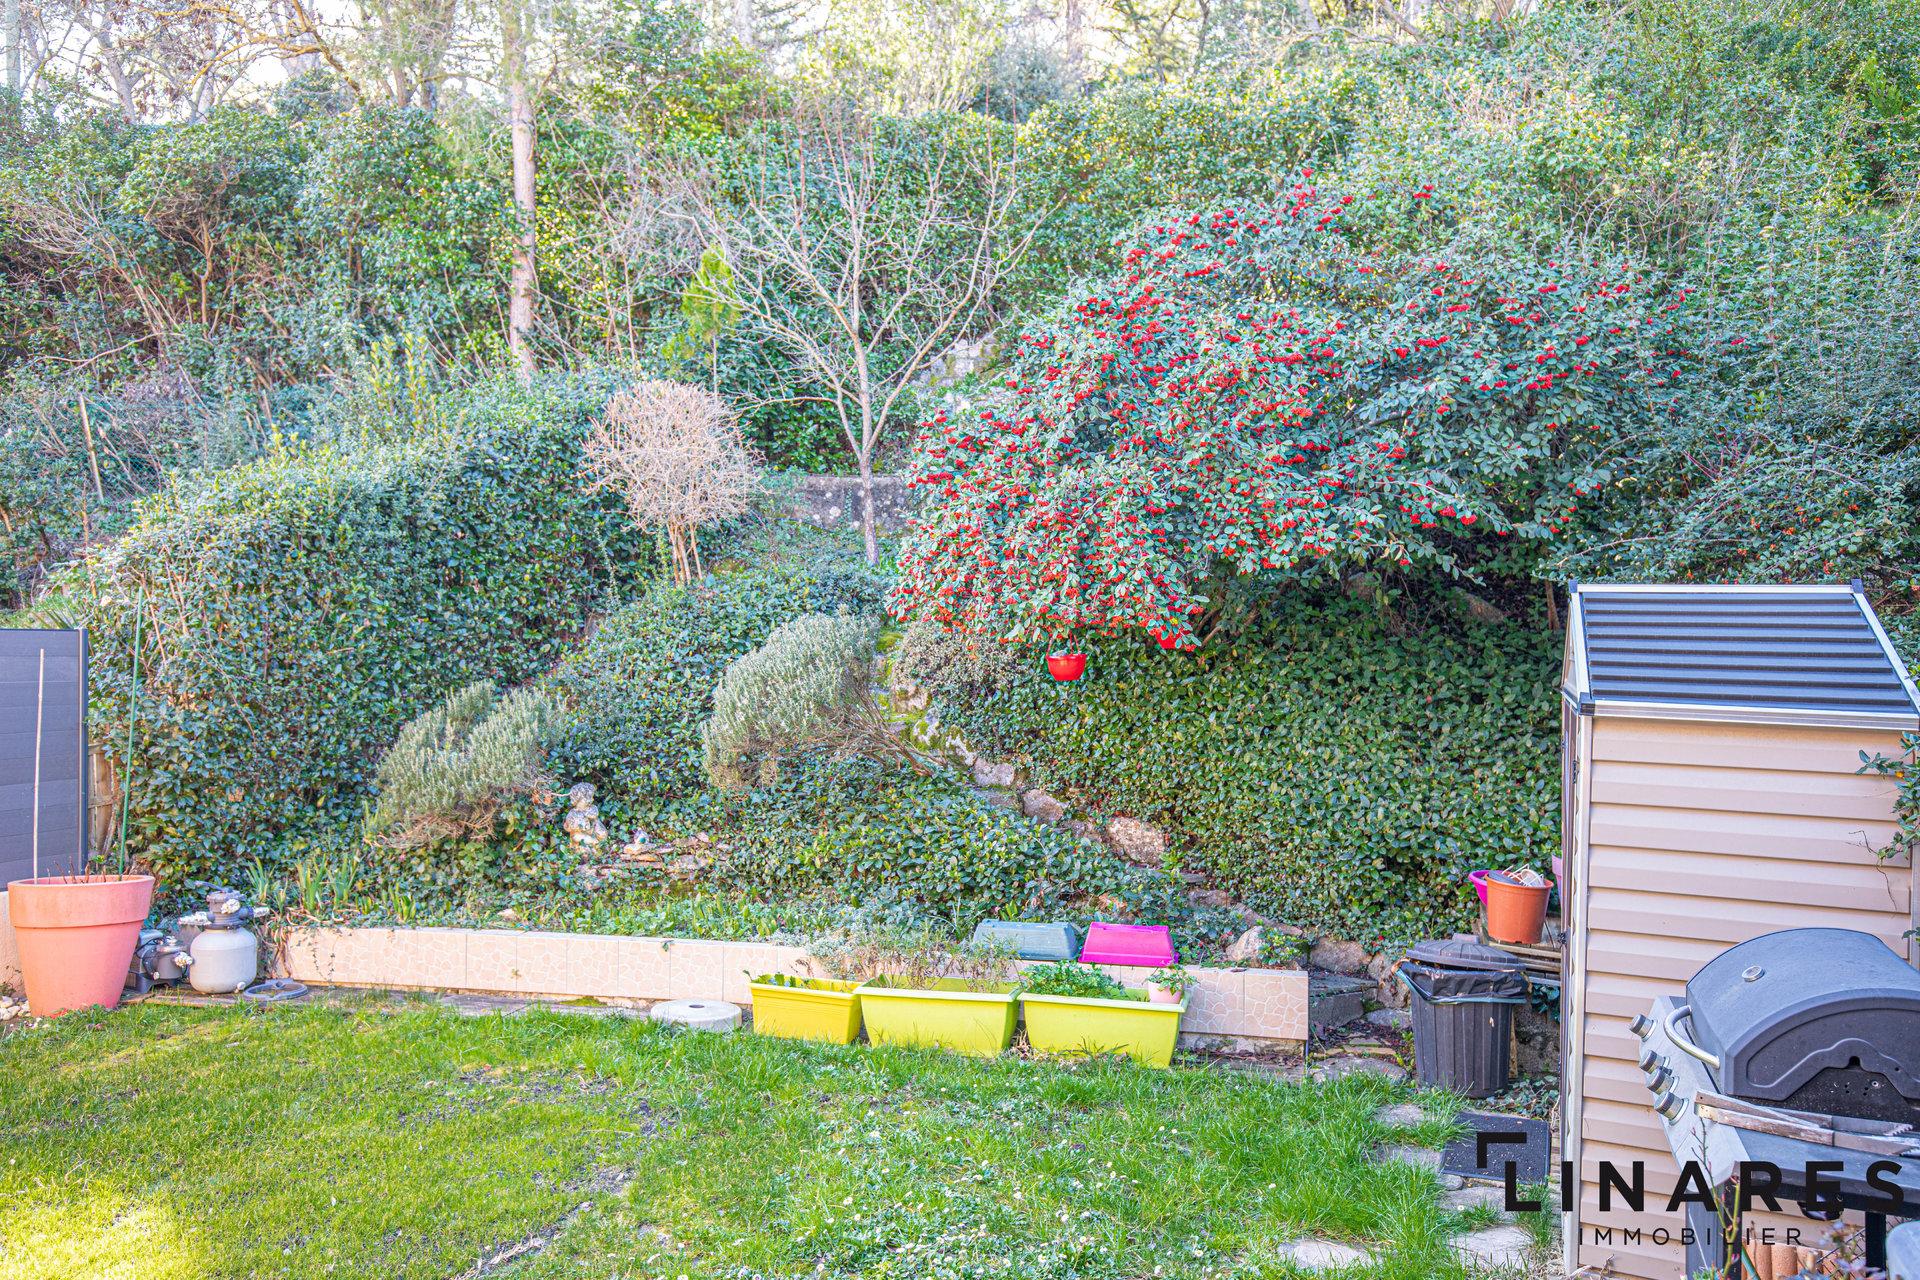 FAMILY HOME - Maison 3 chambres  + Jardin + Terrasse + Garage